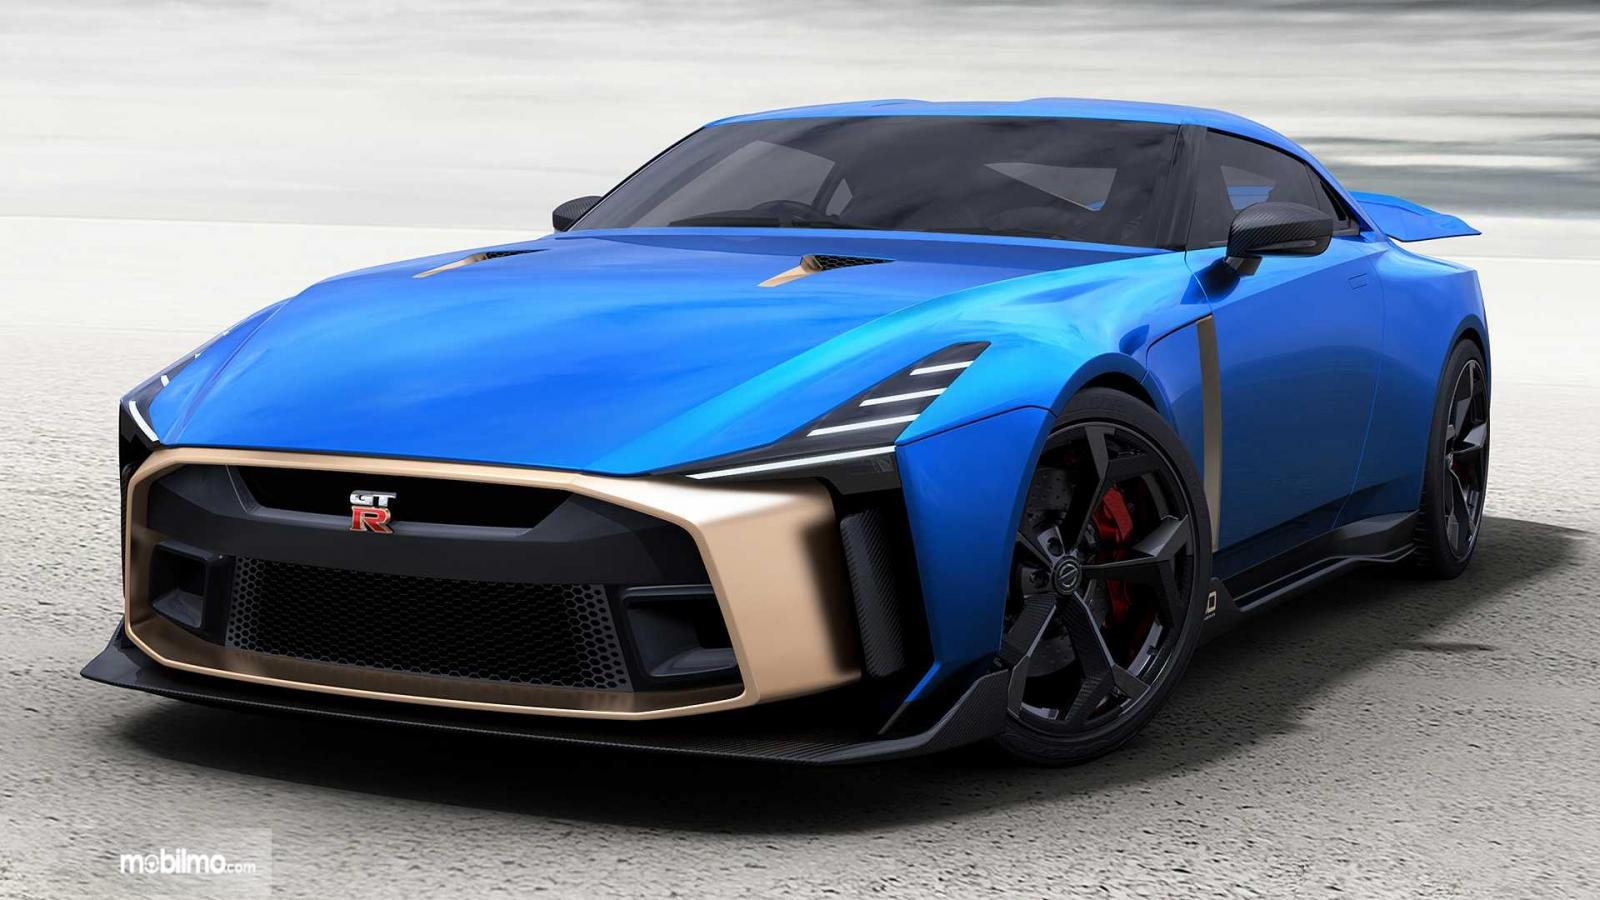 Foto Nissan GT-R50 tampak samping depan